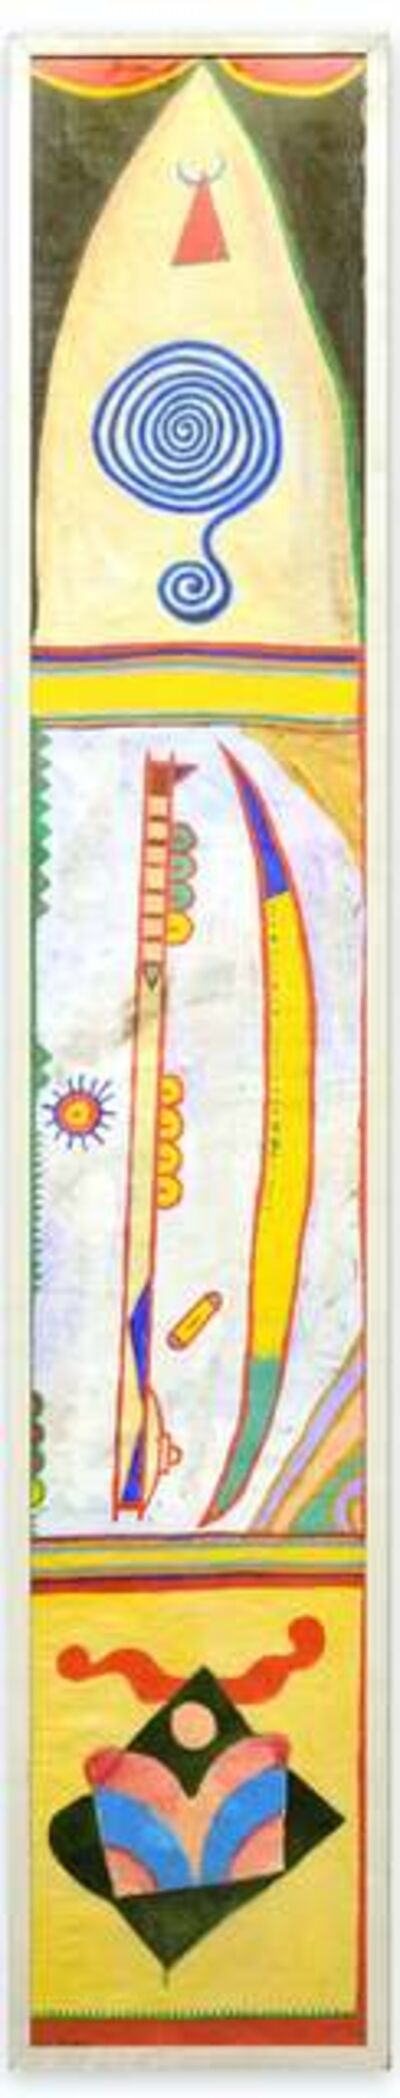 Martin Bradley, 'Boomerang', 1978